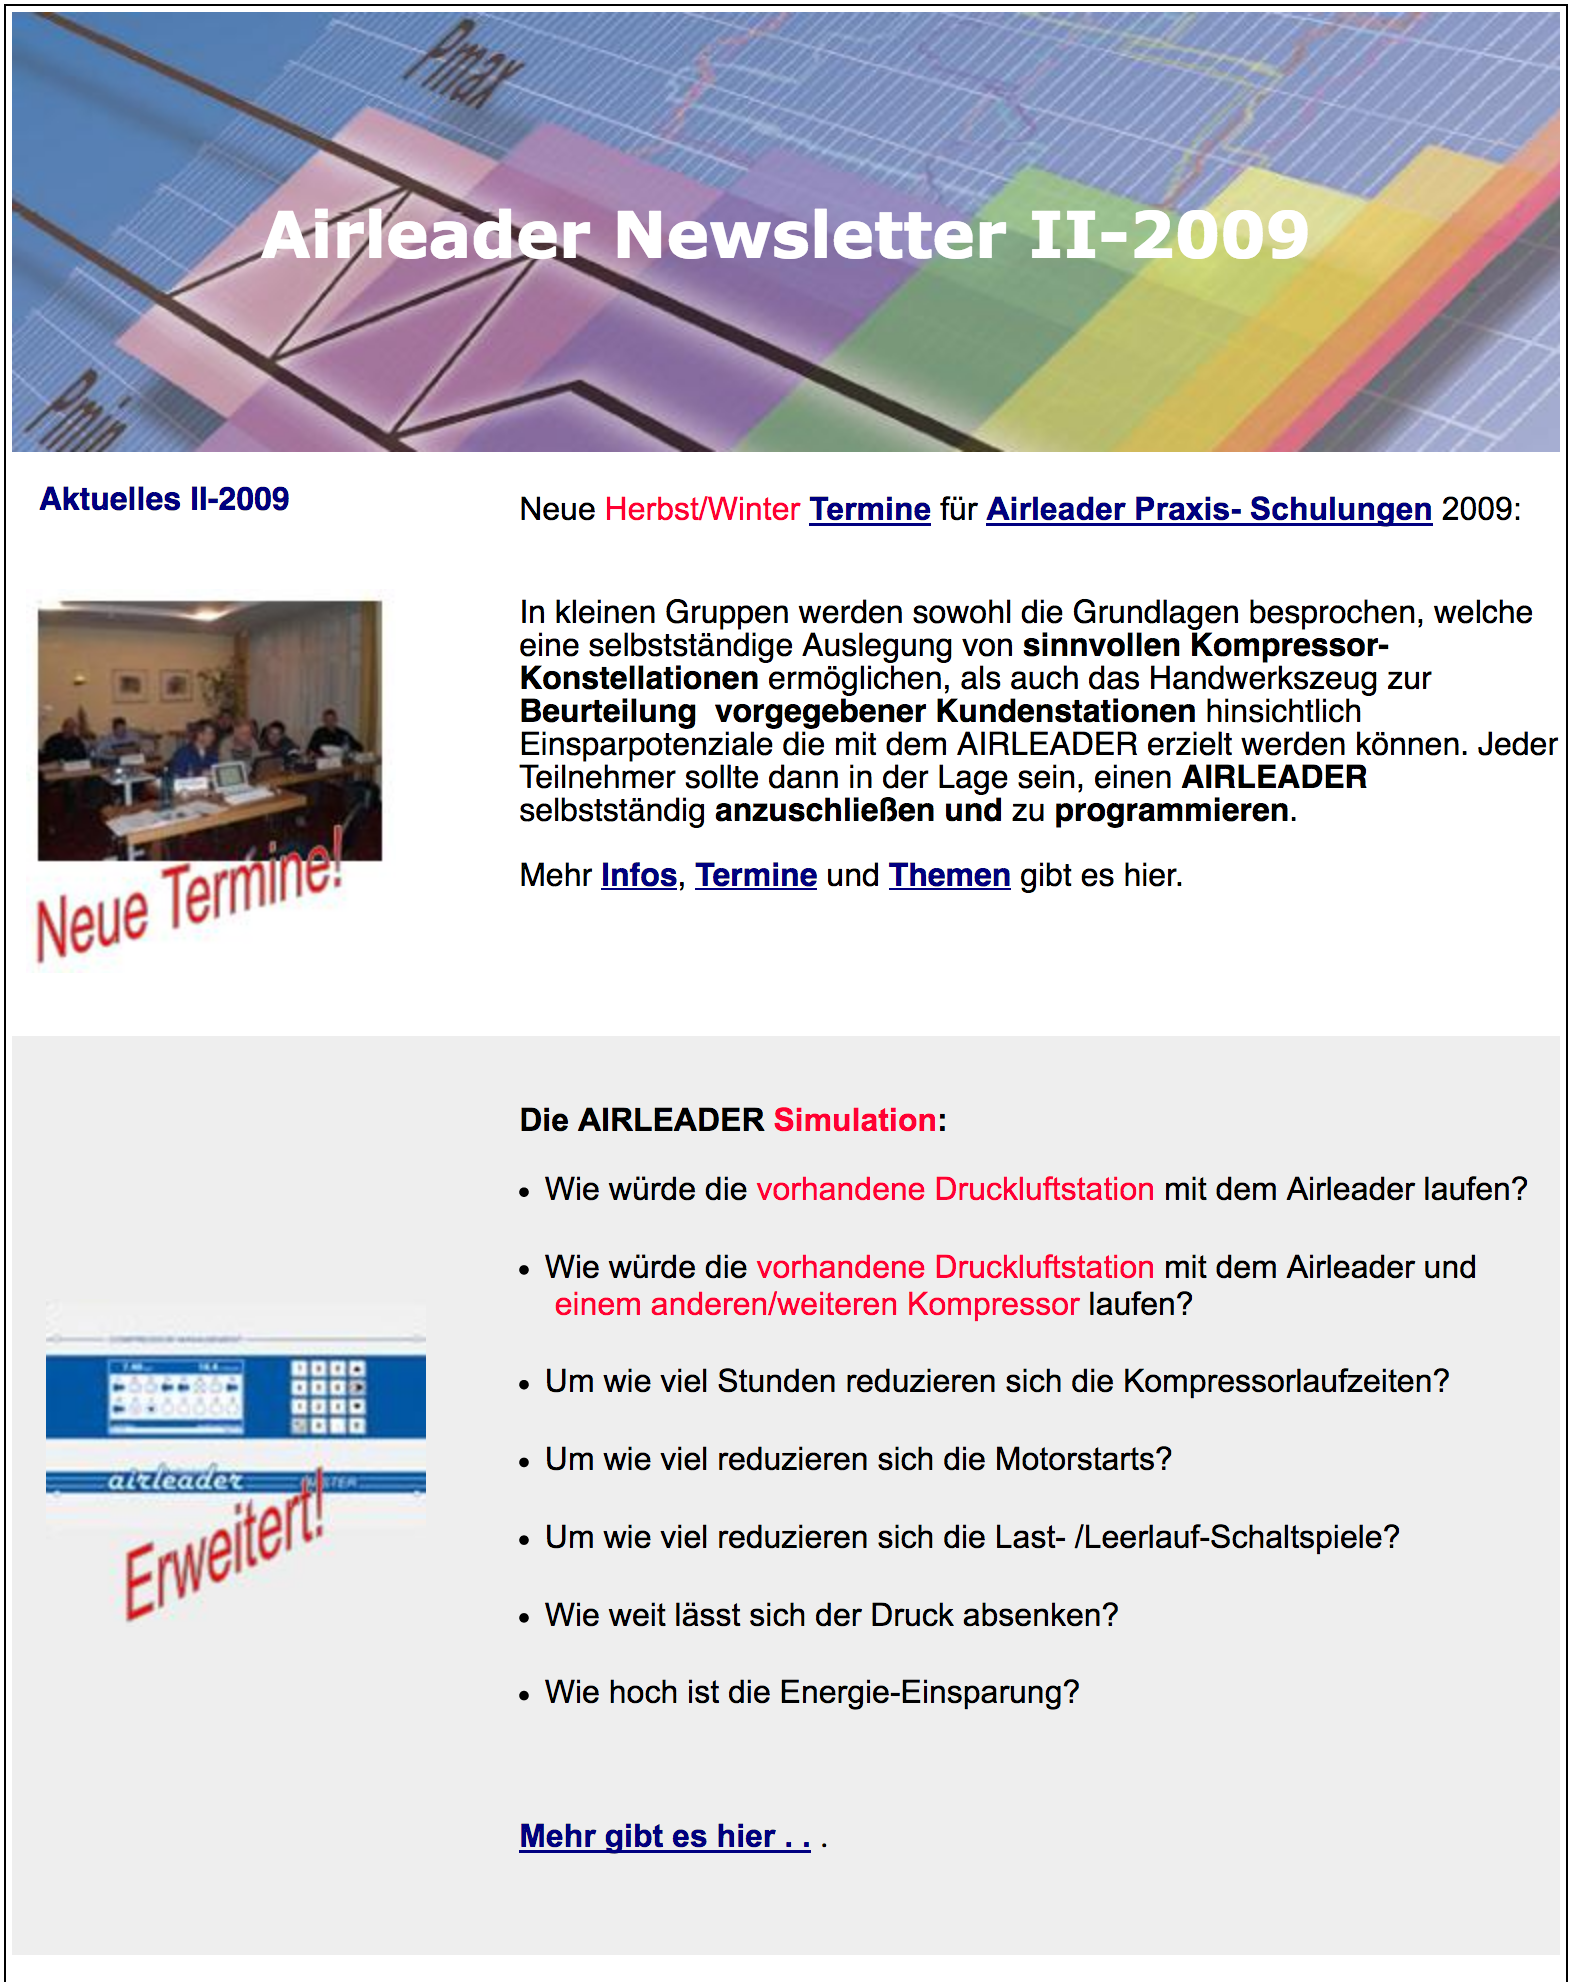 Airl Newsletter II 2009